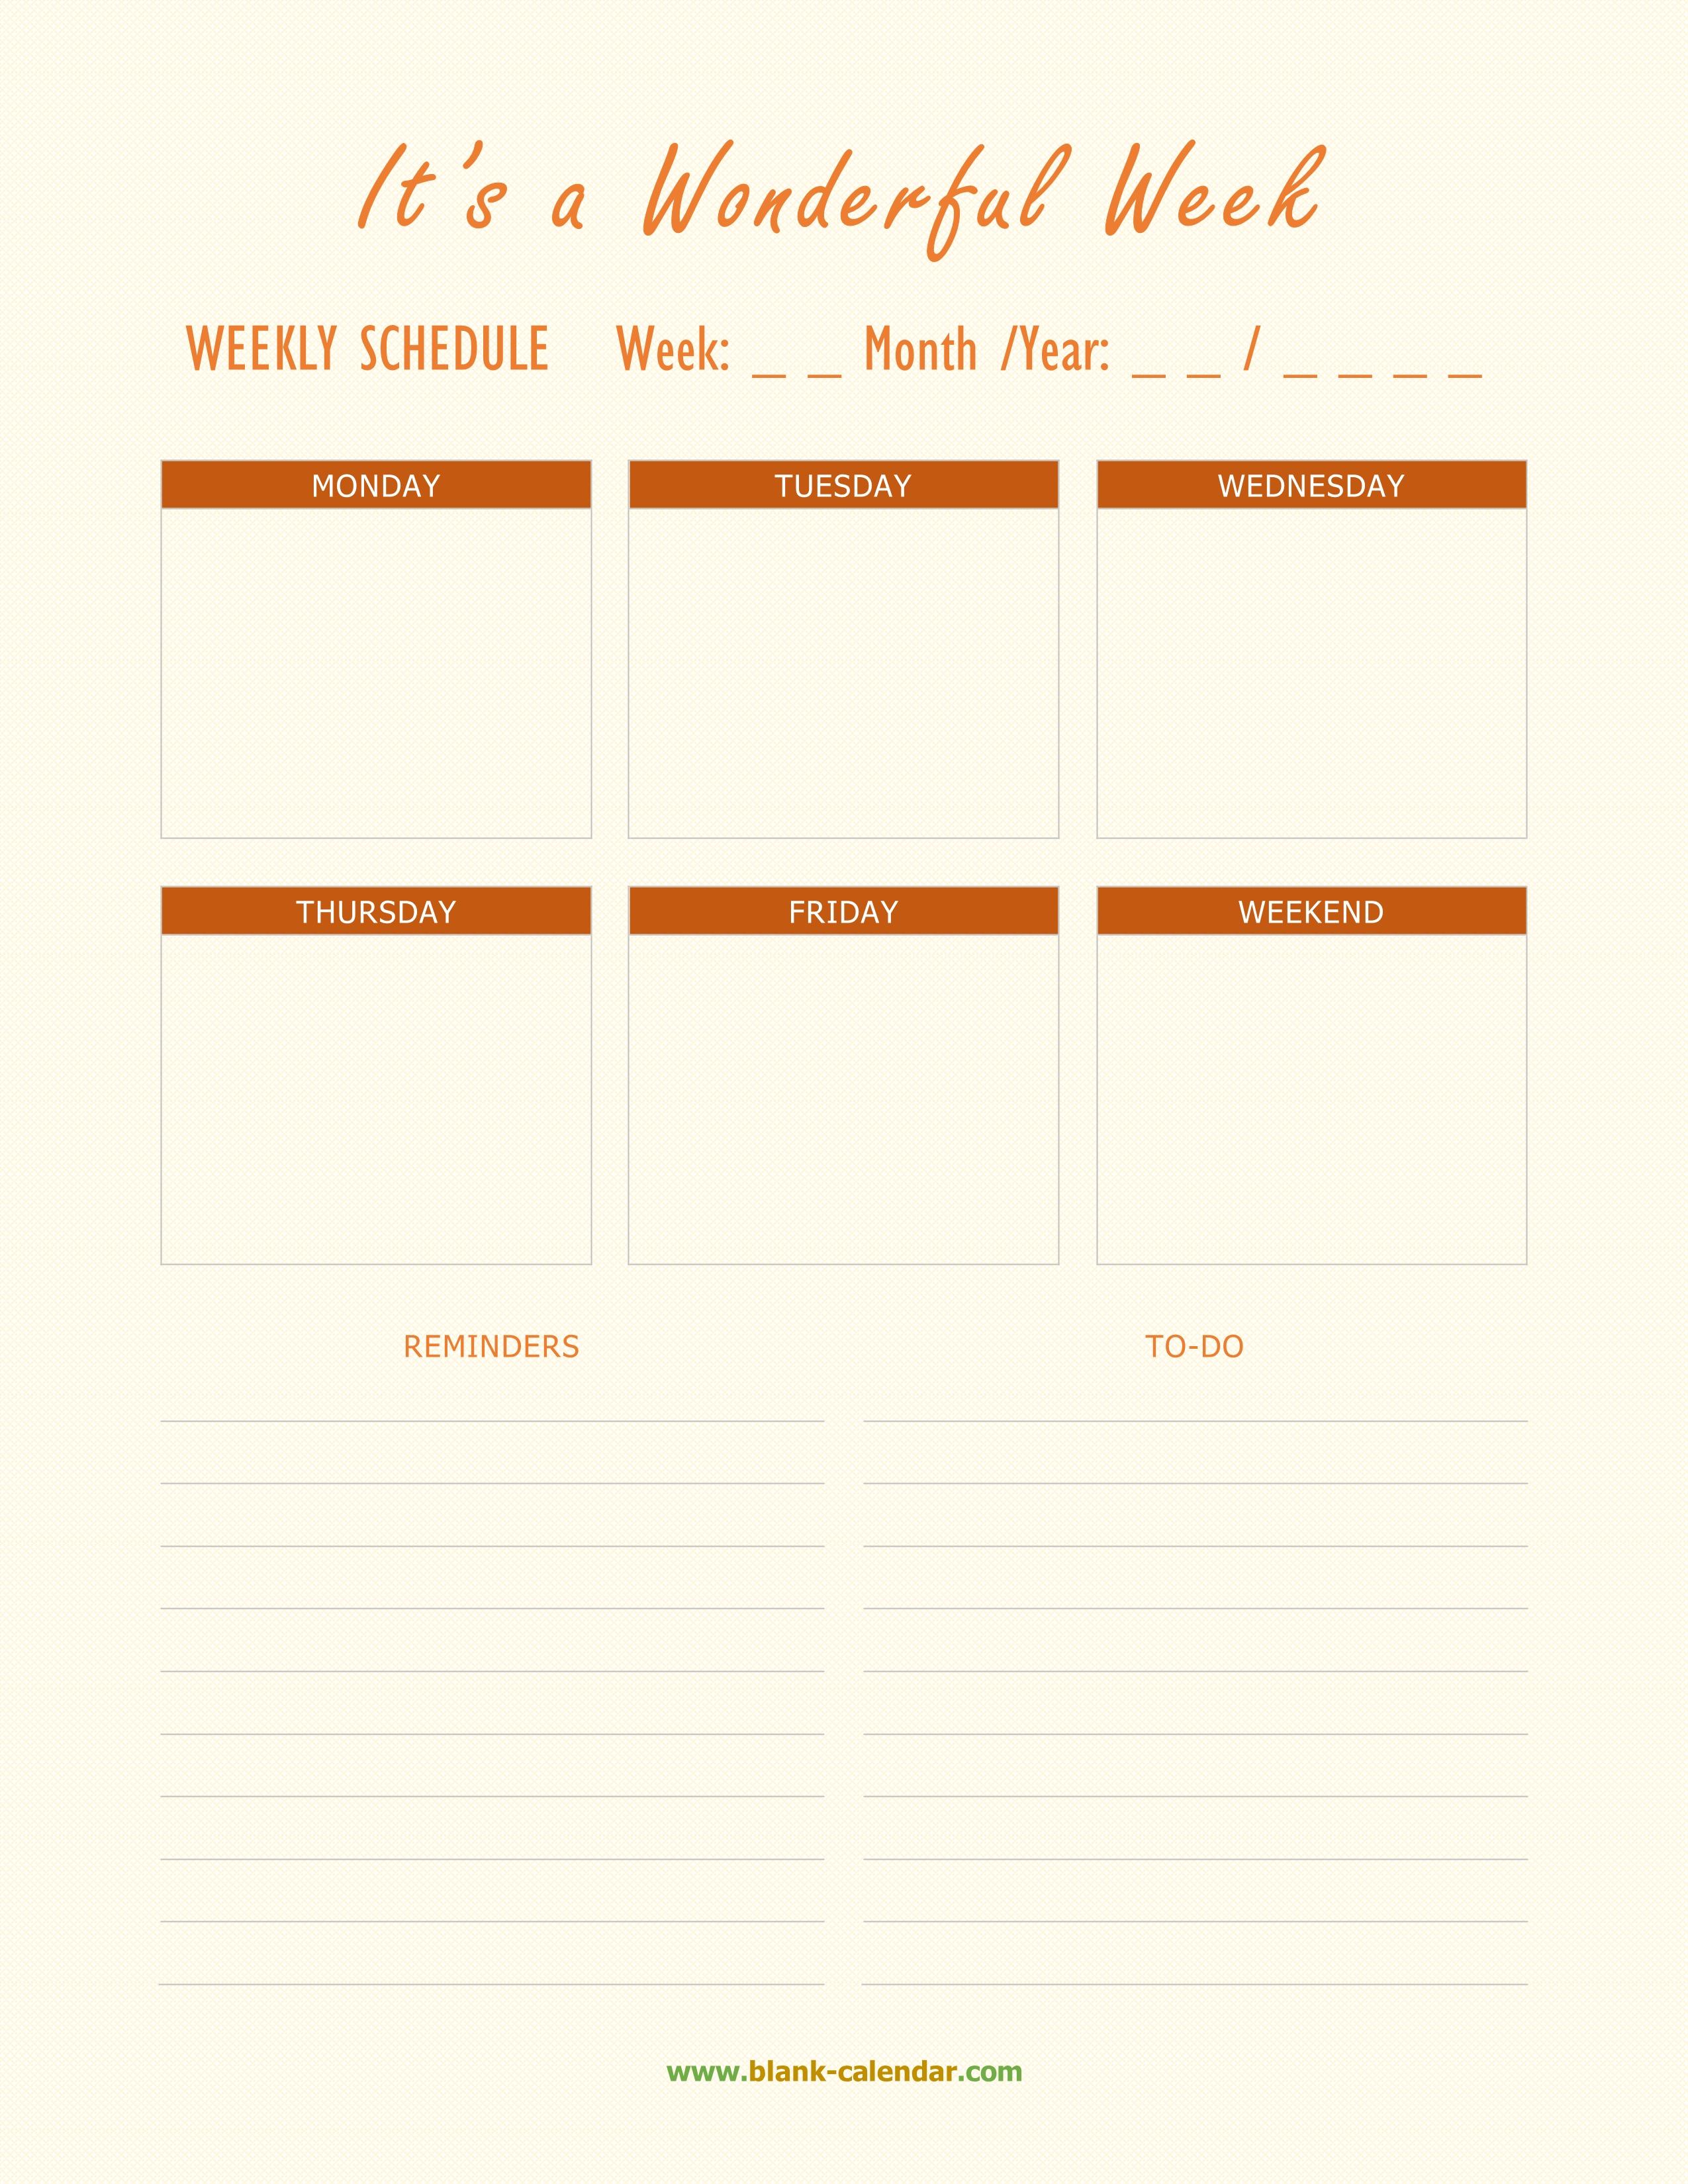 Weekly Schedule Planner Templates Word Excel Pdf